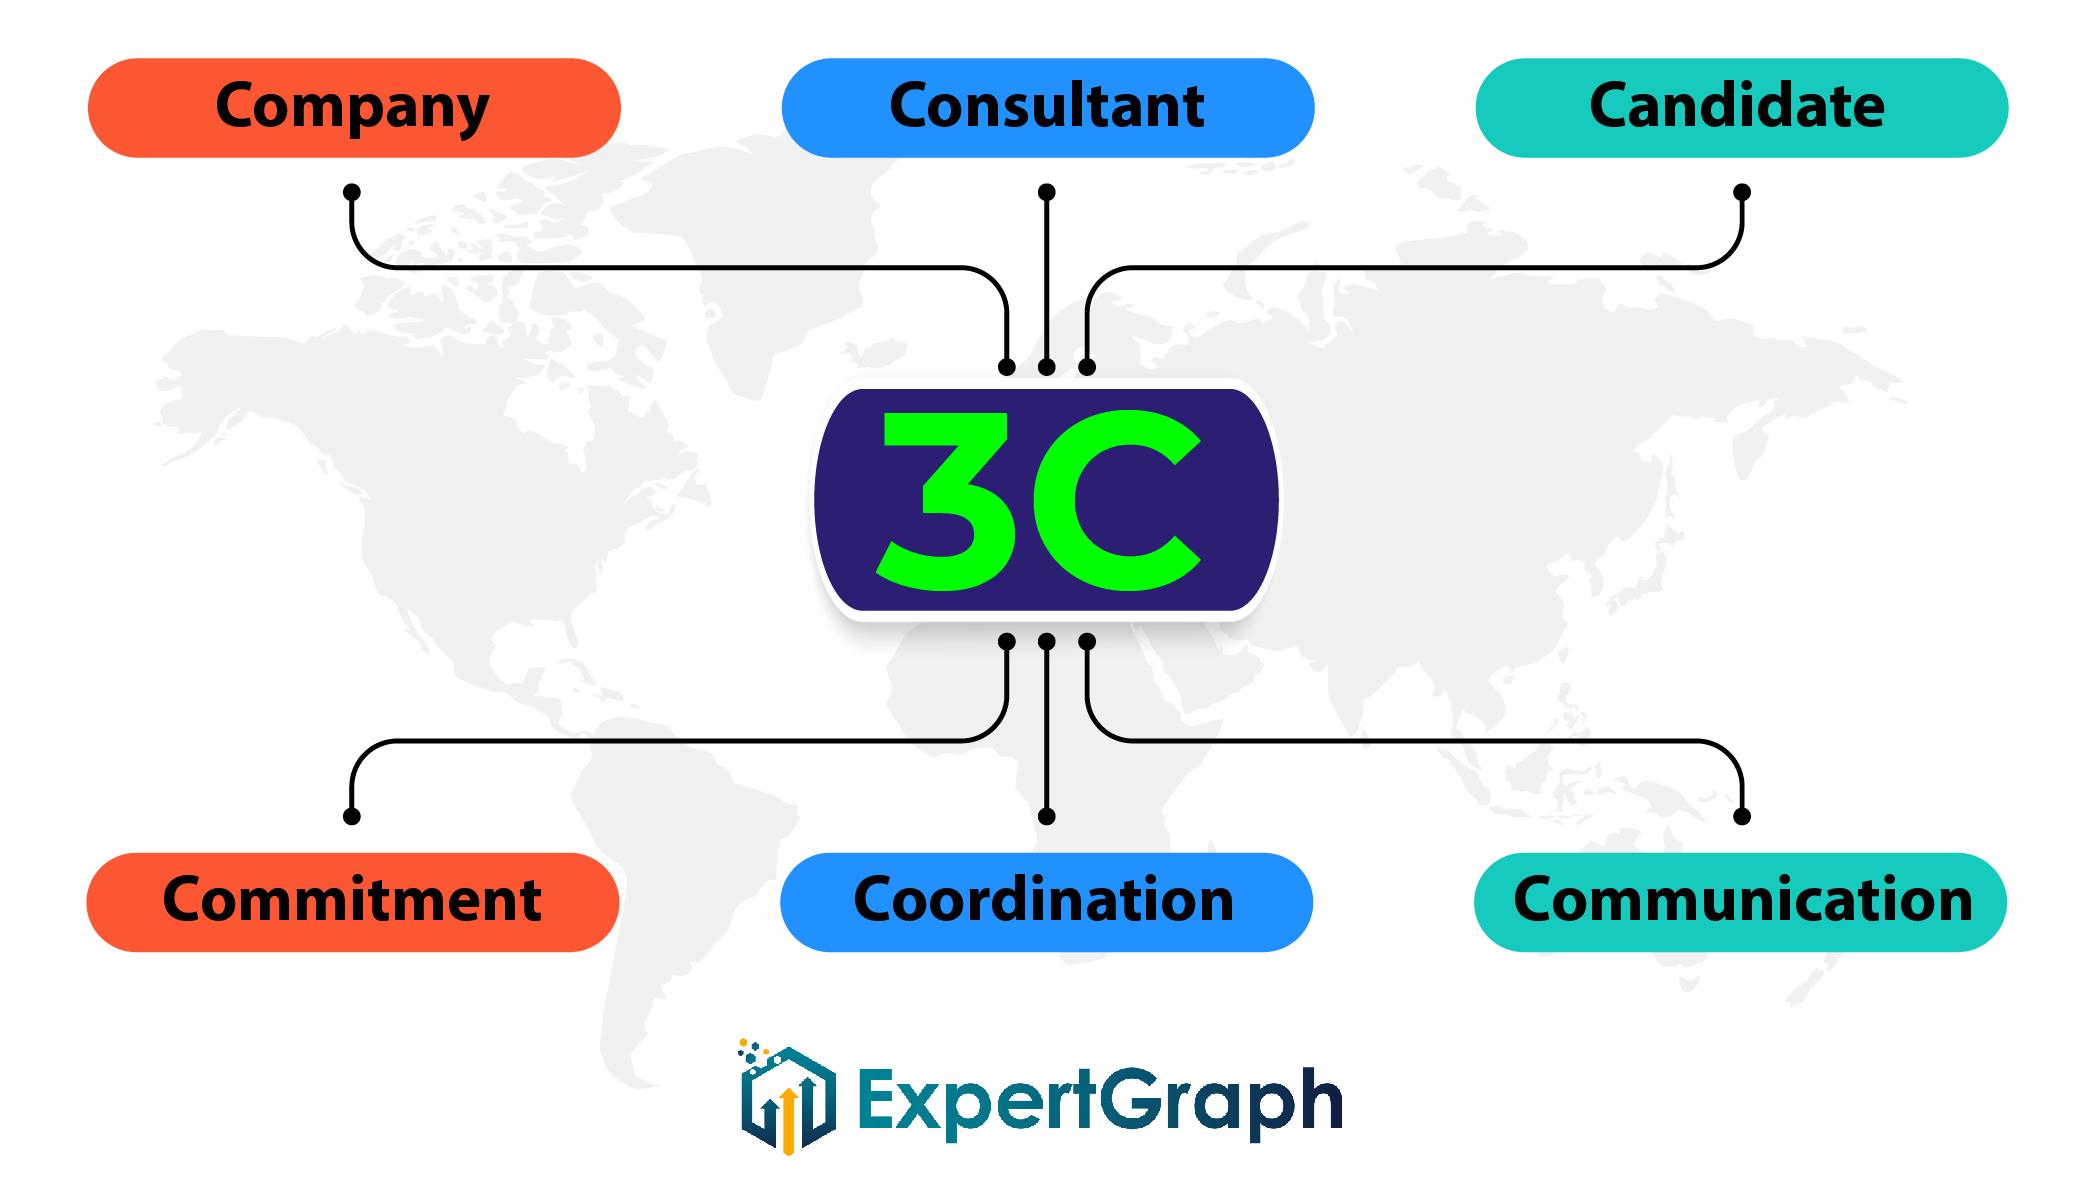 expertgraph